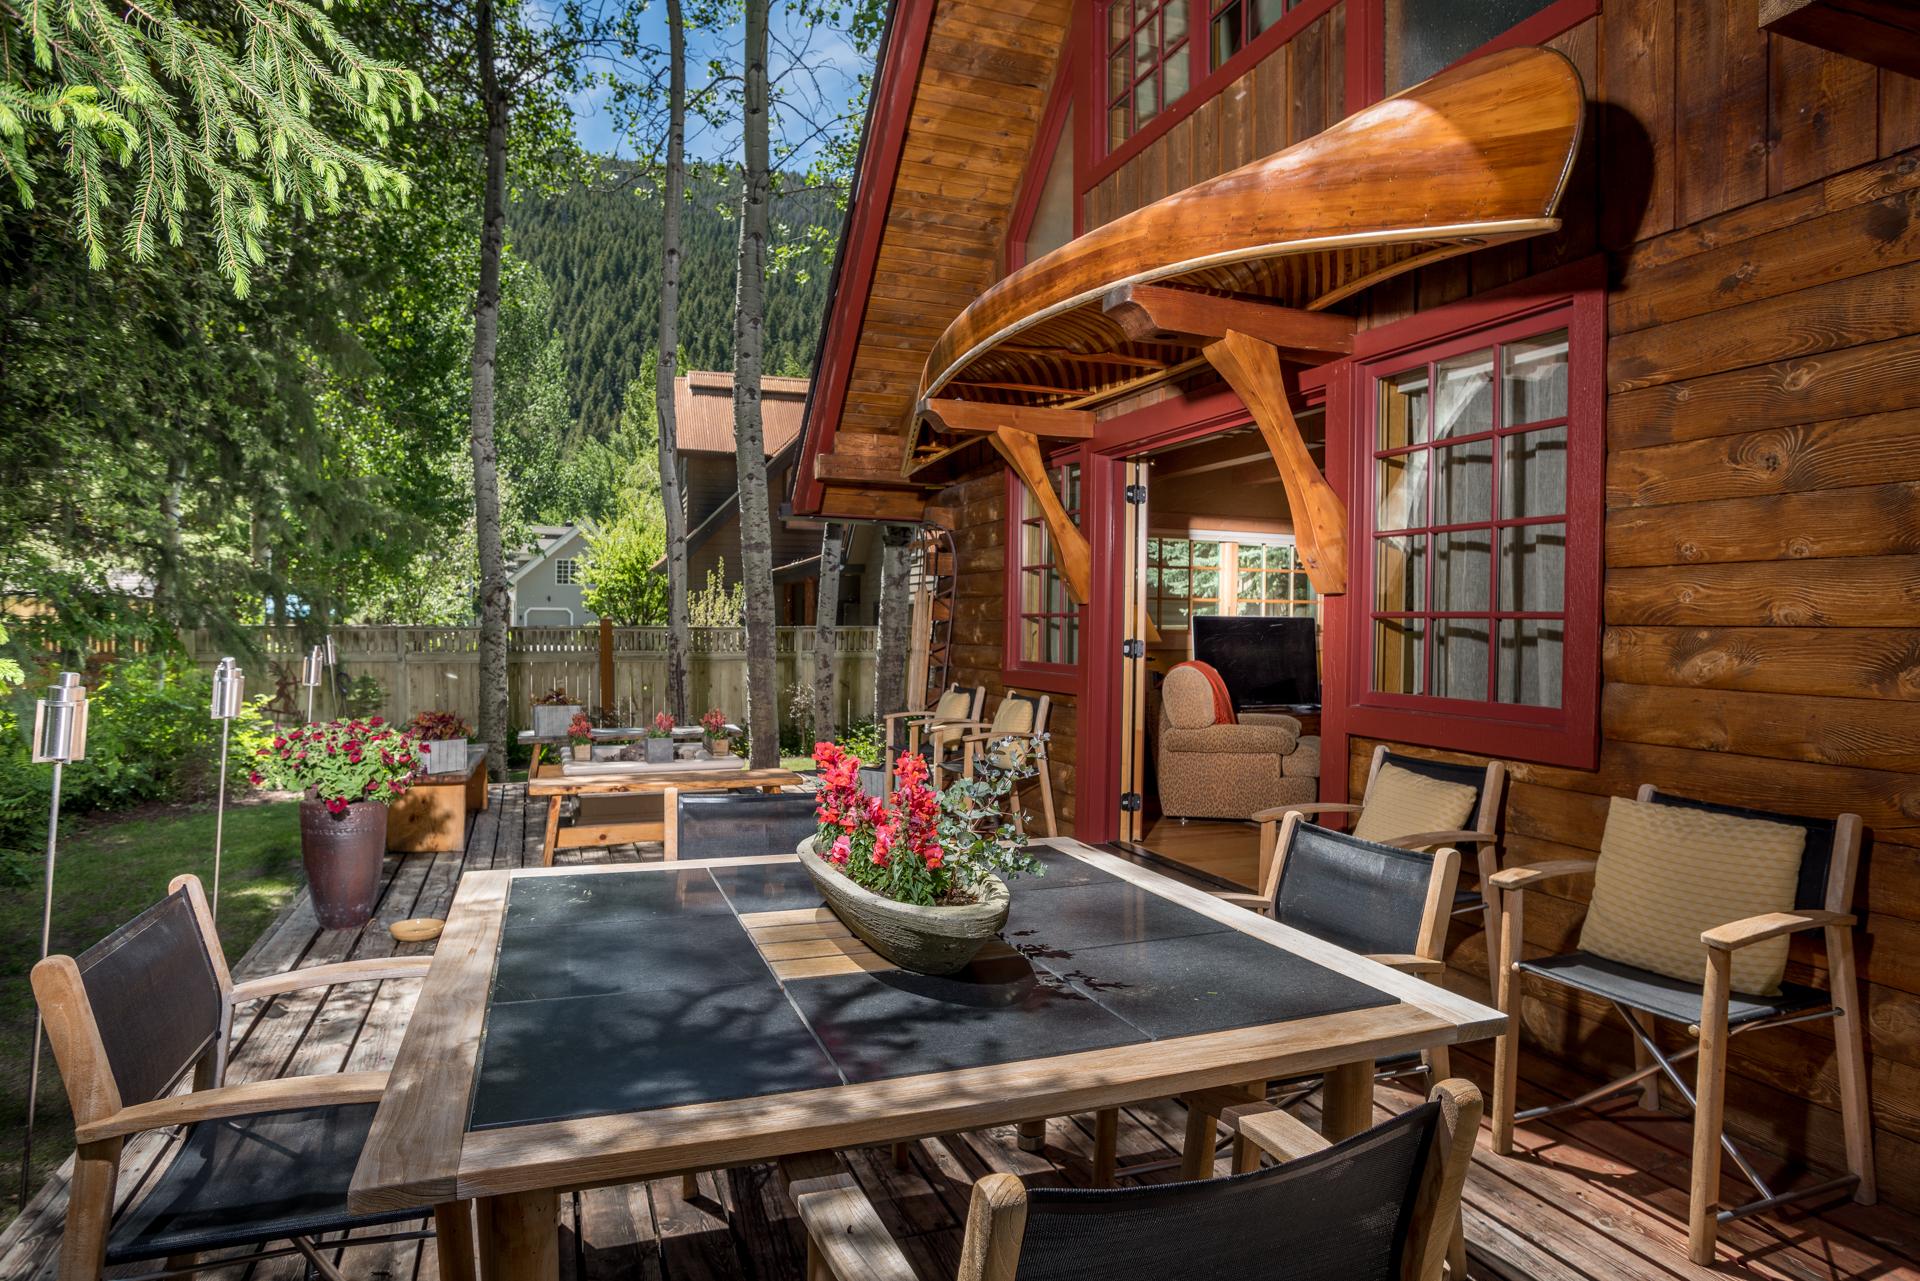 Outdoor Living at 325 Bald Mountain Road in Ketchum, Idaho